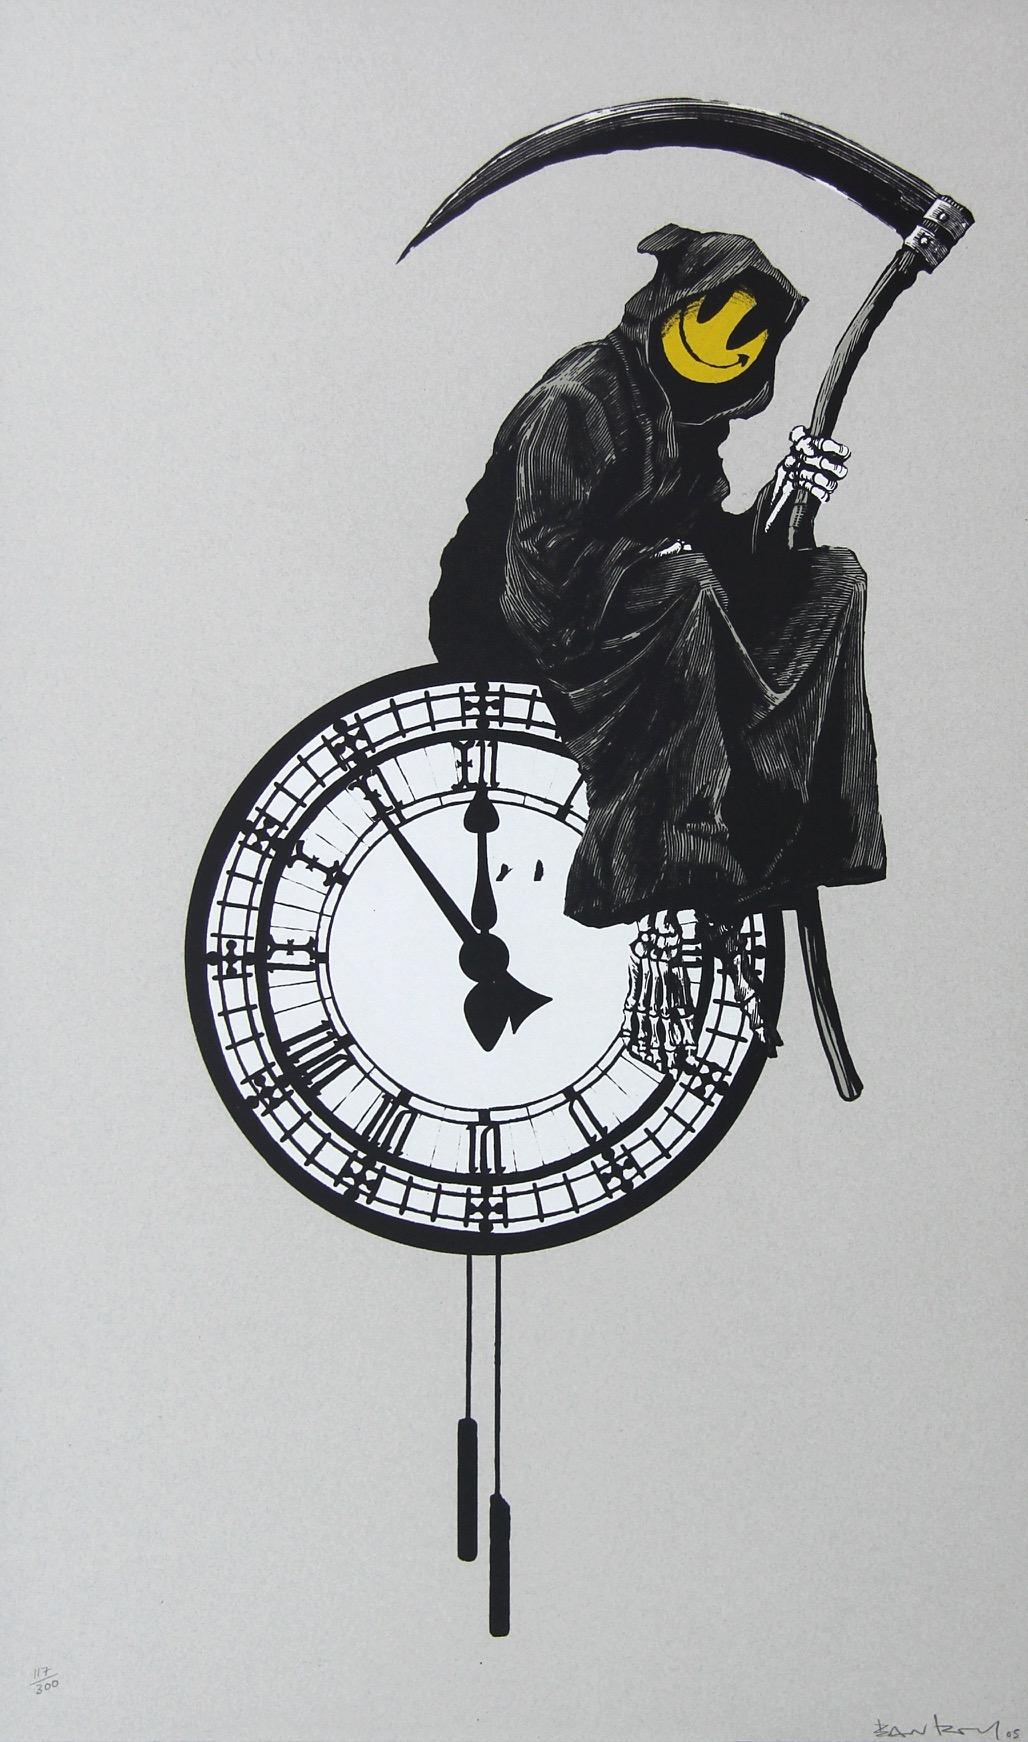 Banksy-Grin-Reaper-P-BKY-001